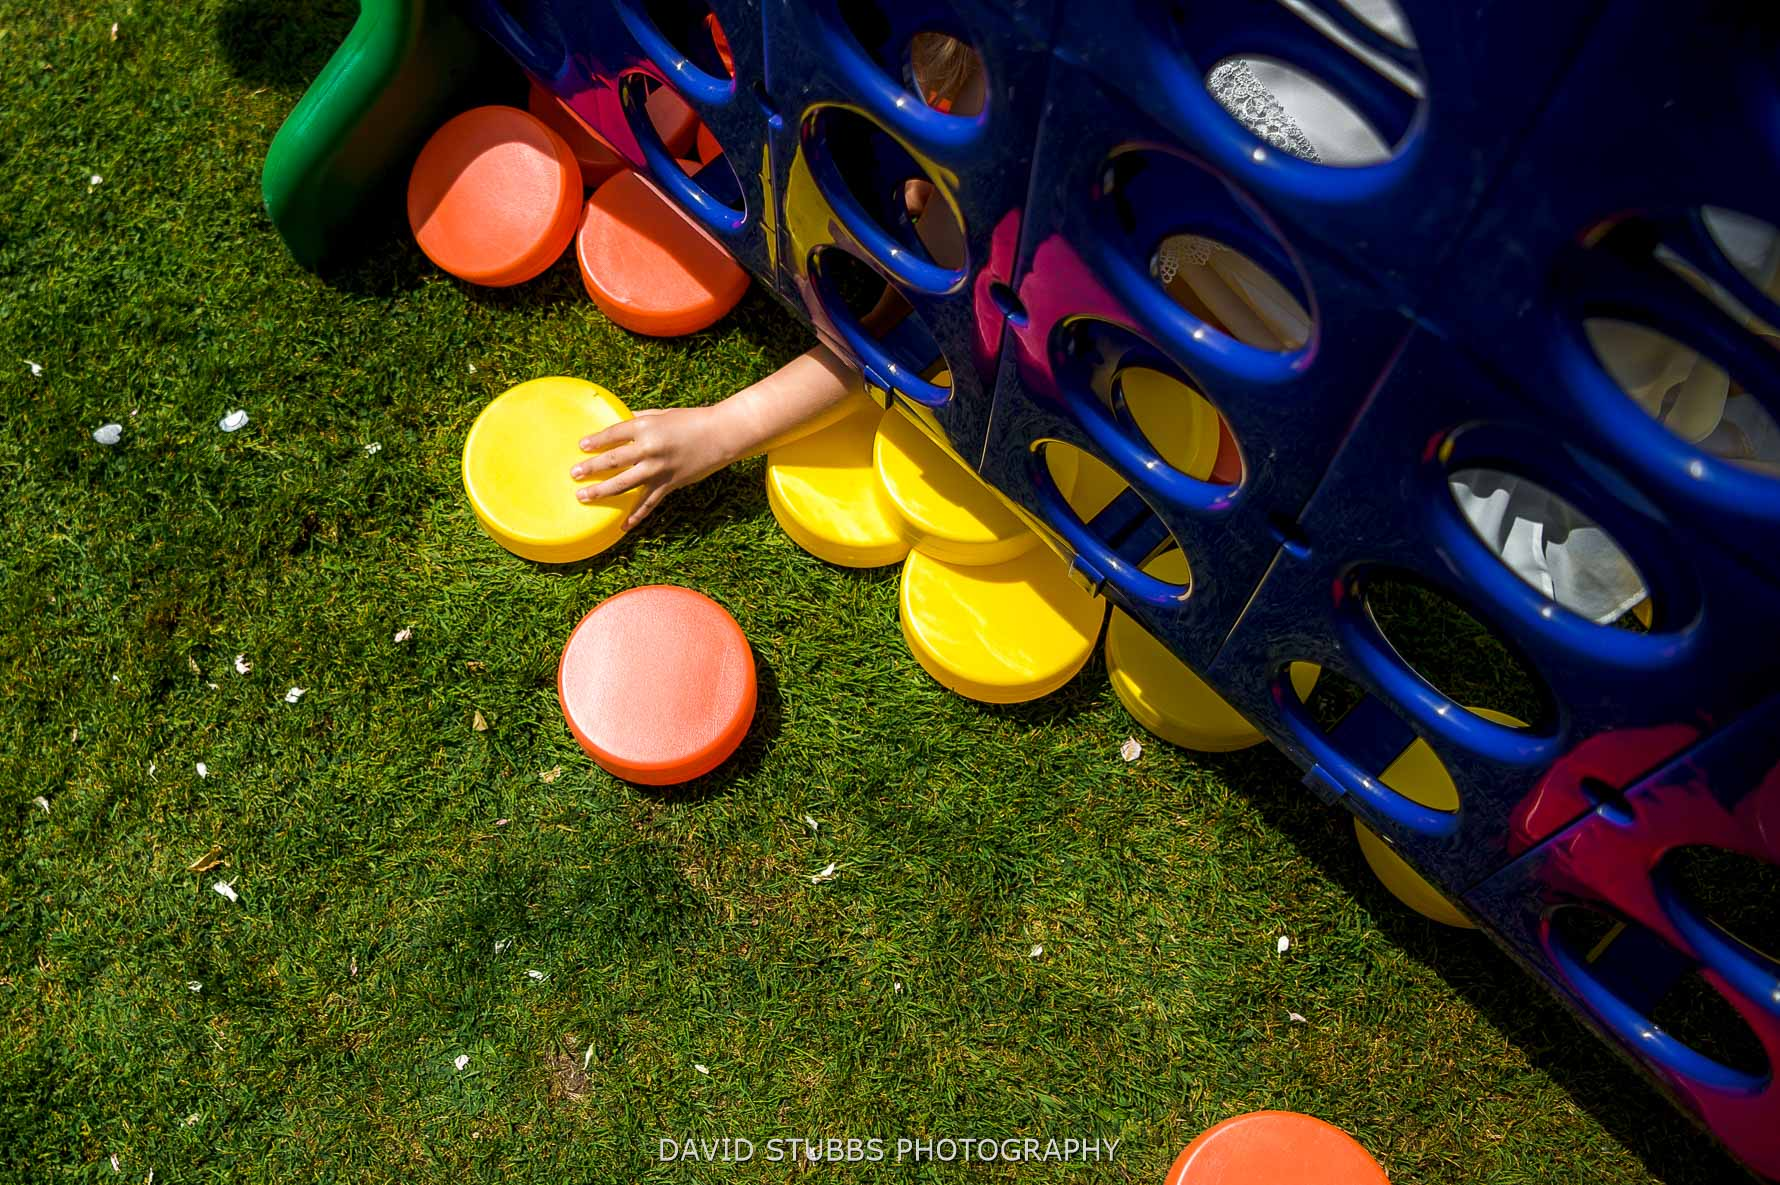 hand sticking out garden games